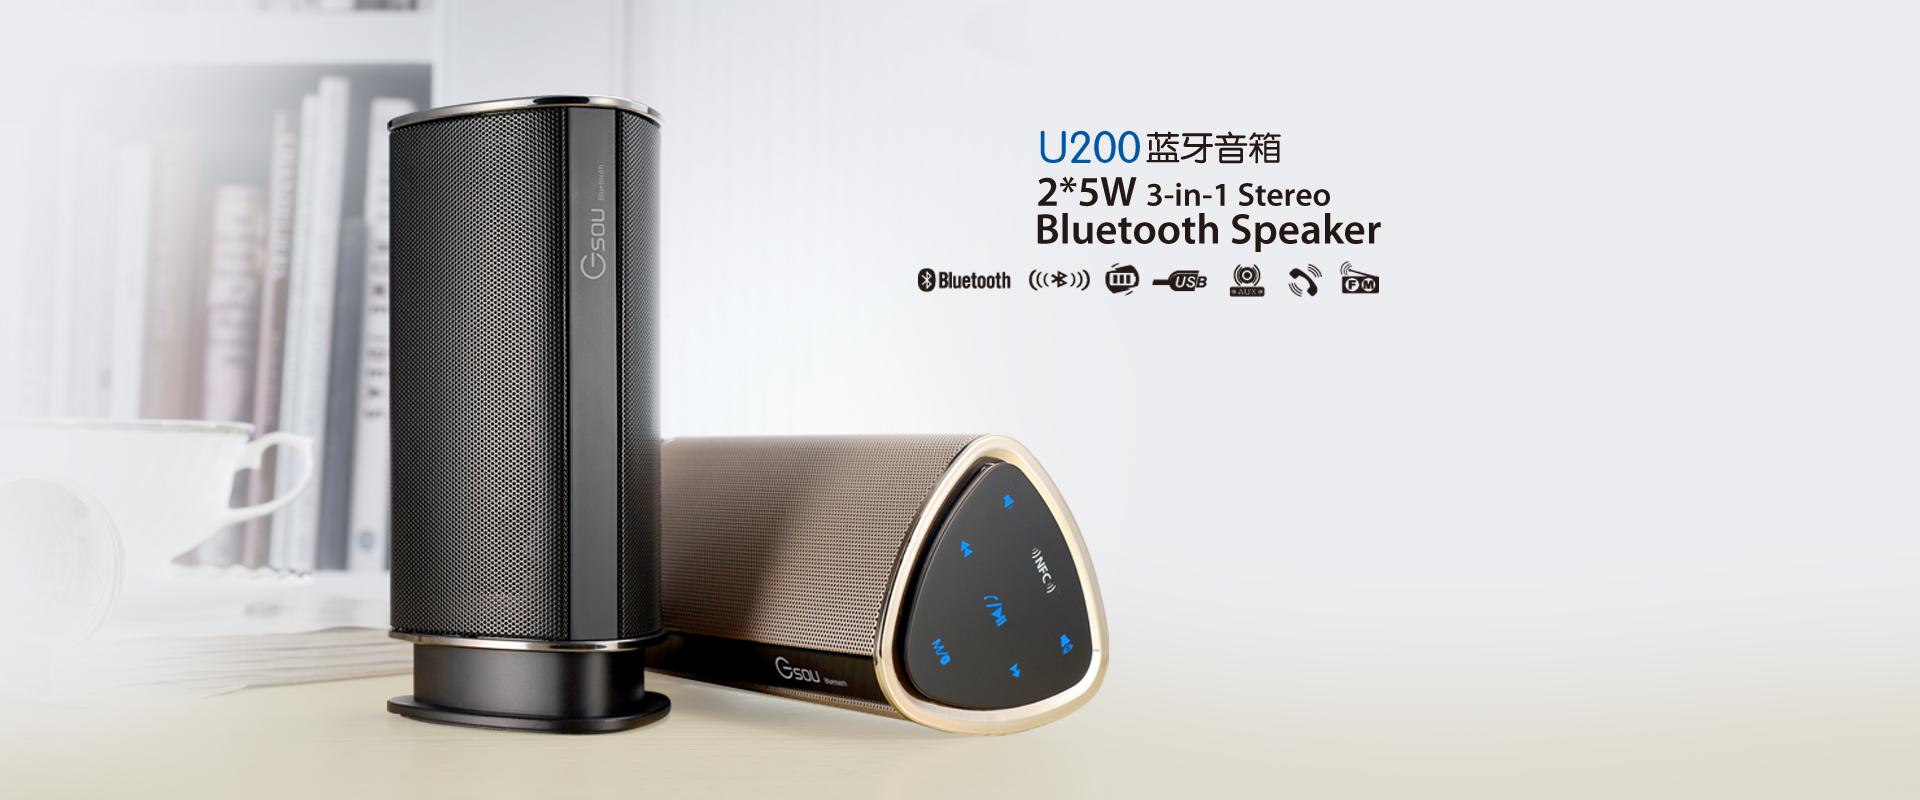 U200 蓝牙音箱